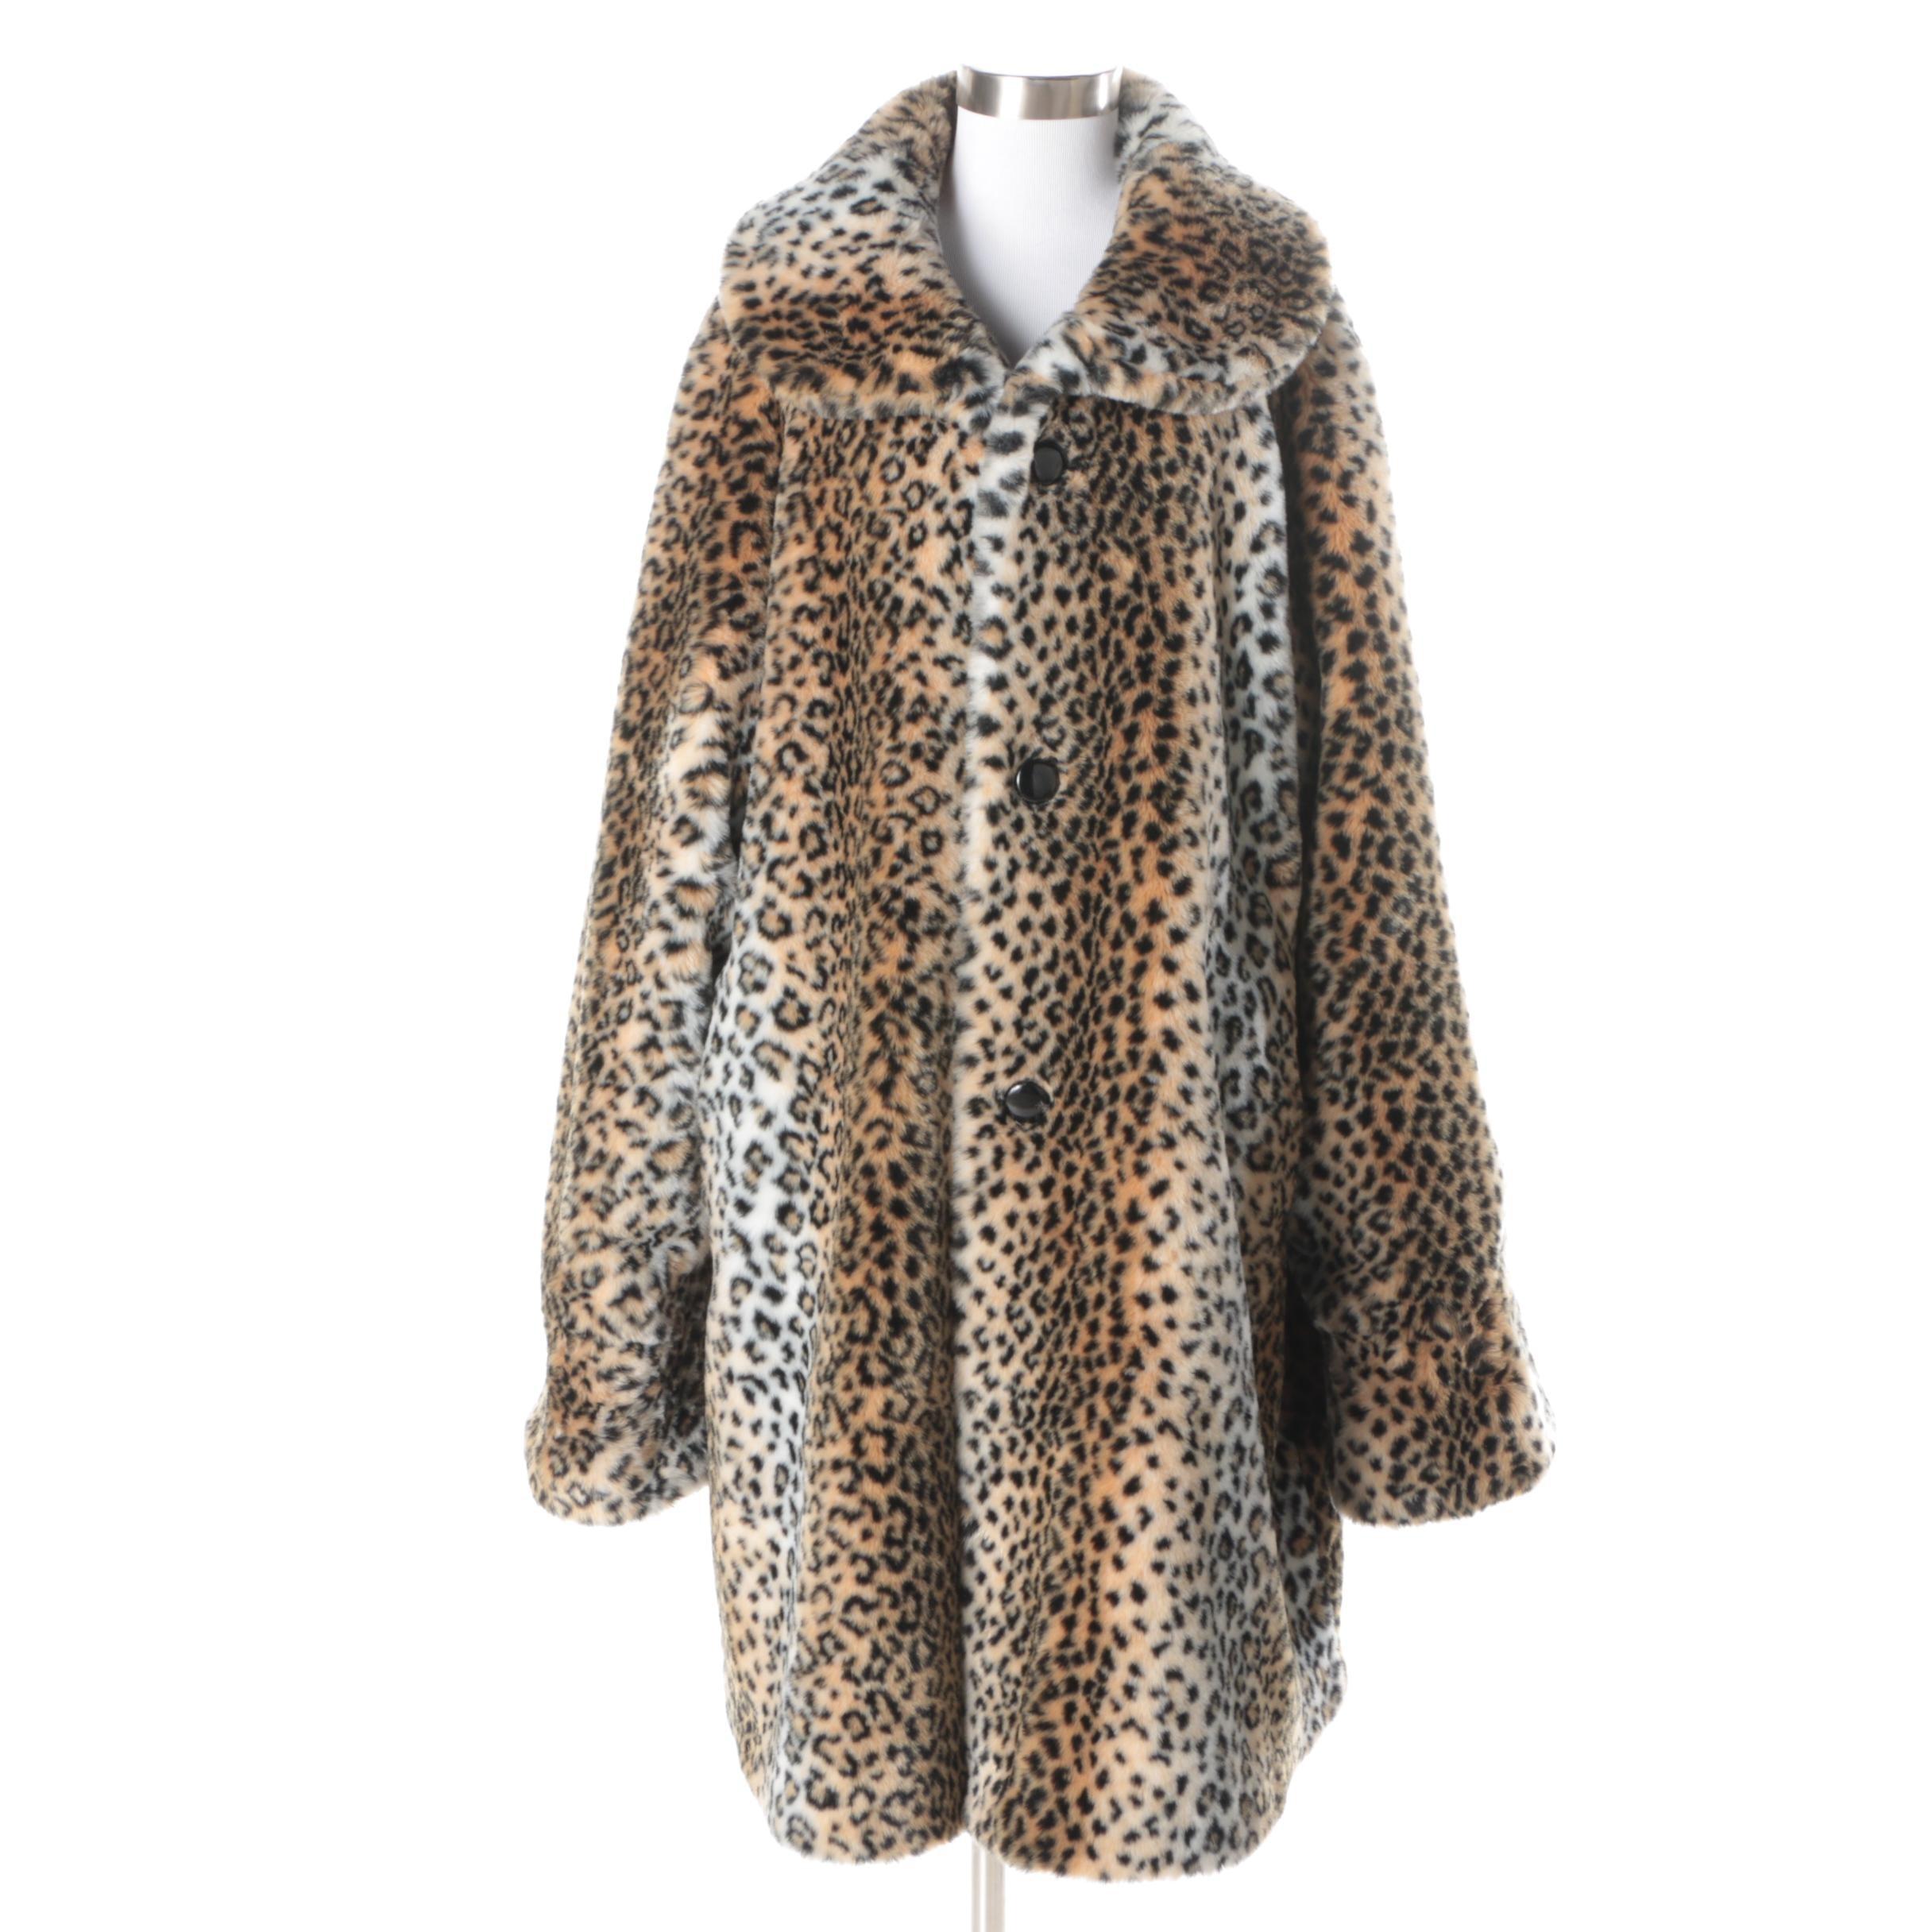 Women's Faux Leopard and Faux Leather Reversible Coat